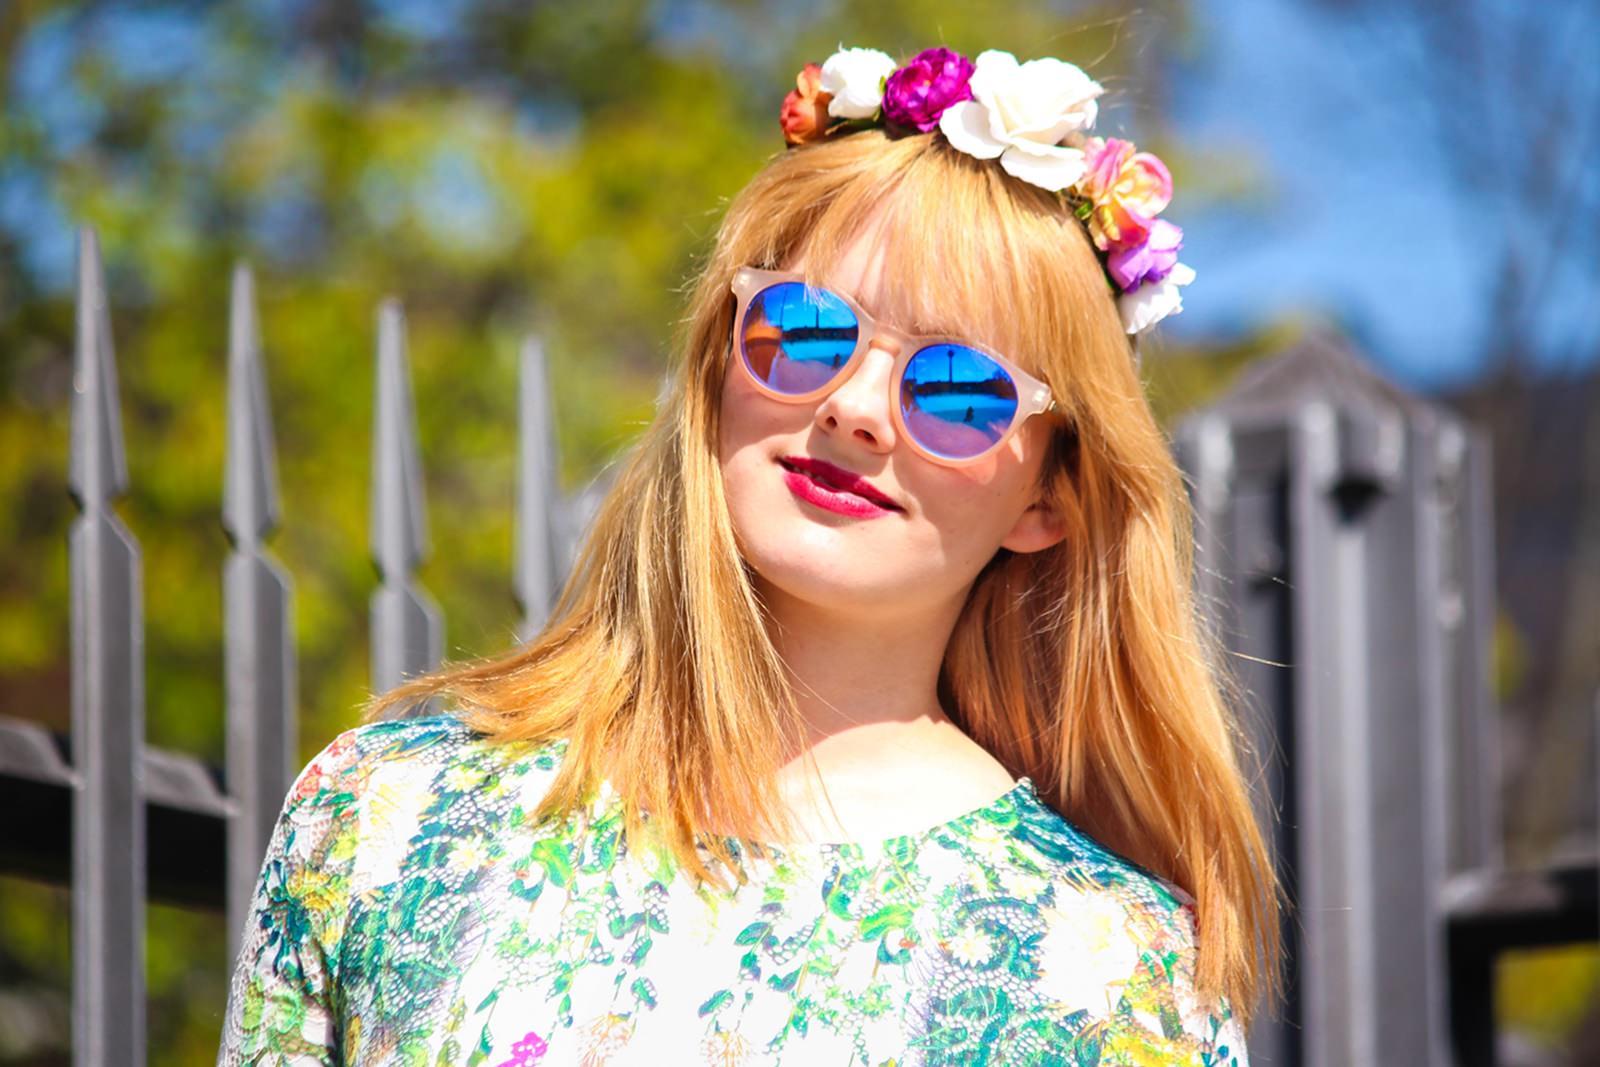 Des Belles Choses_Fashionblog Cologne_Forever 21 Flower Dress 6